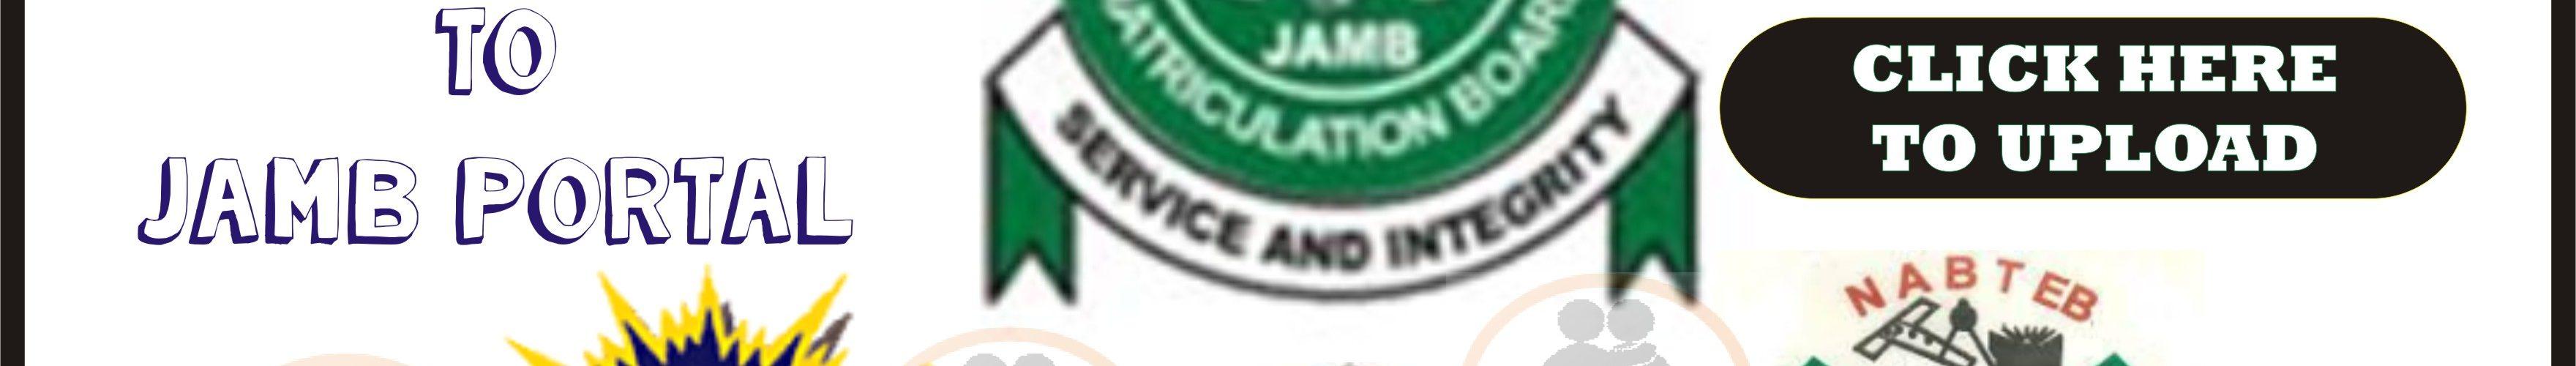 How to Re-upload Waec Result on Jamb Portal 2020